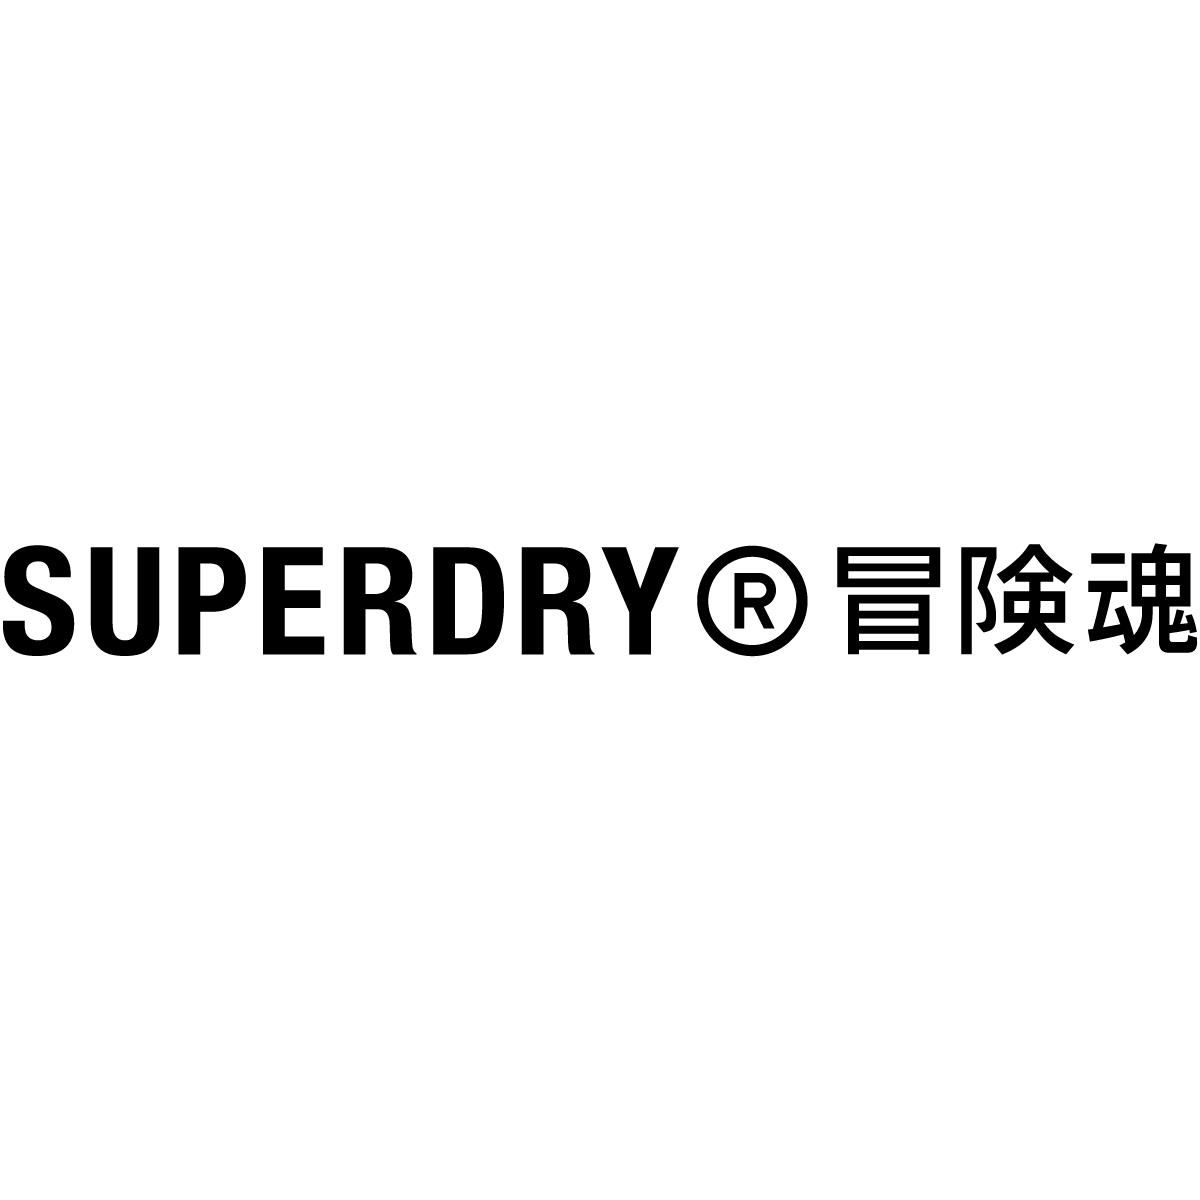 Superdry™ Outlet